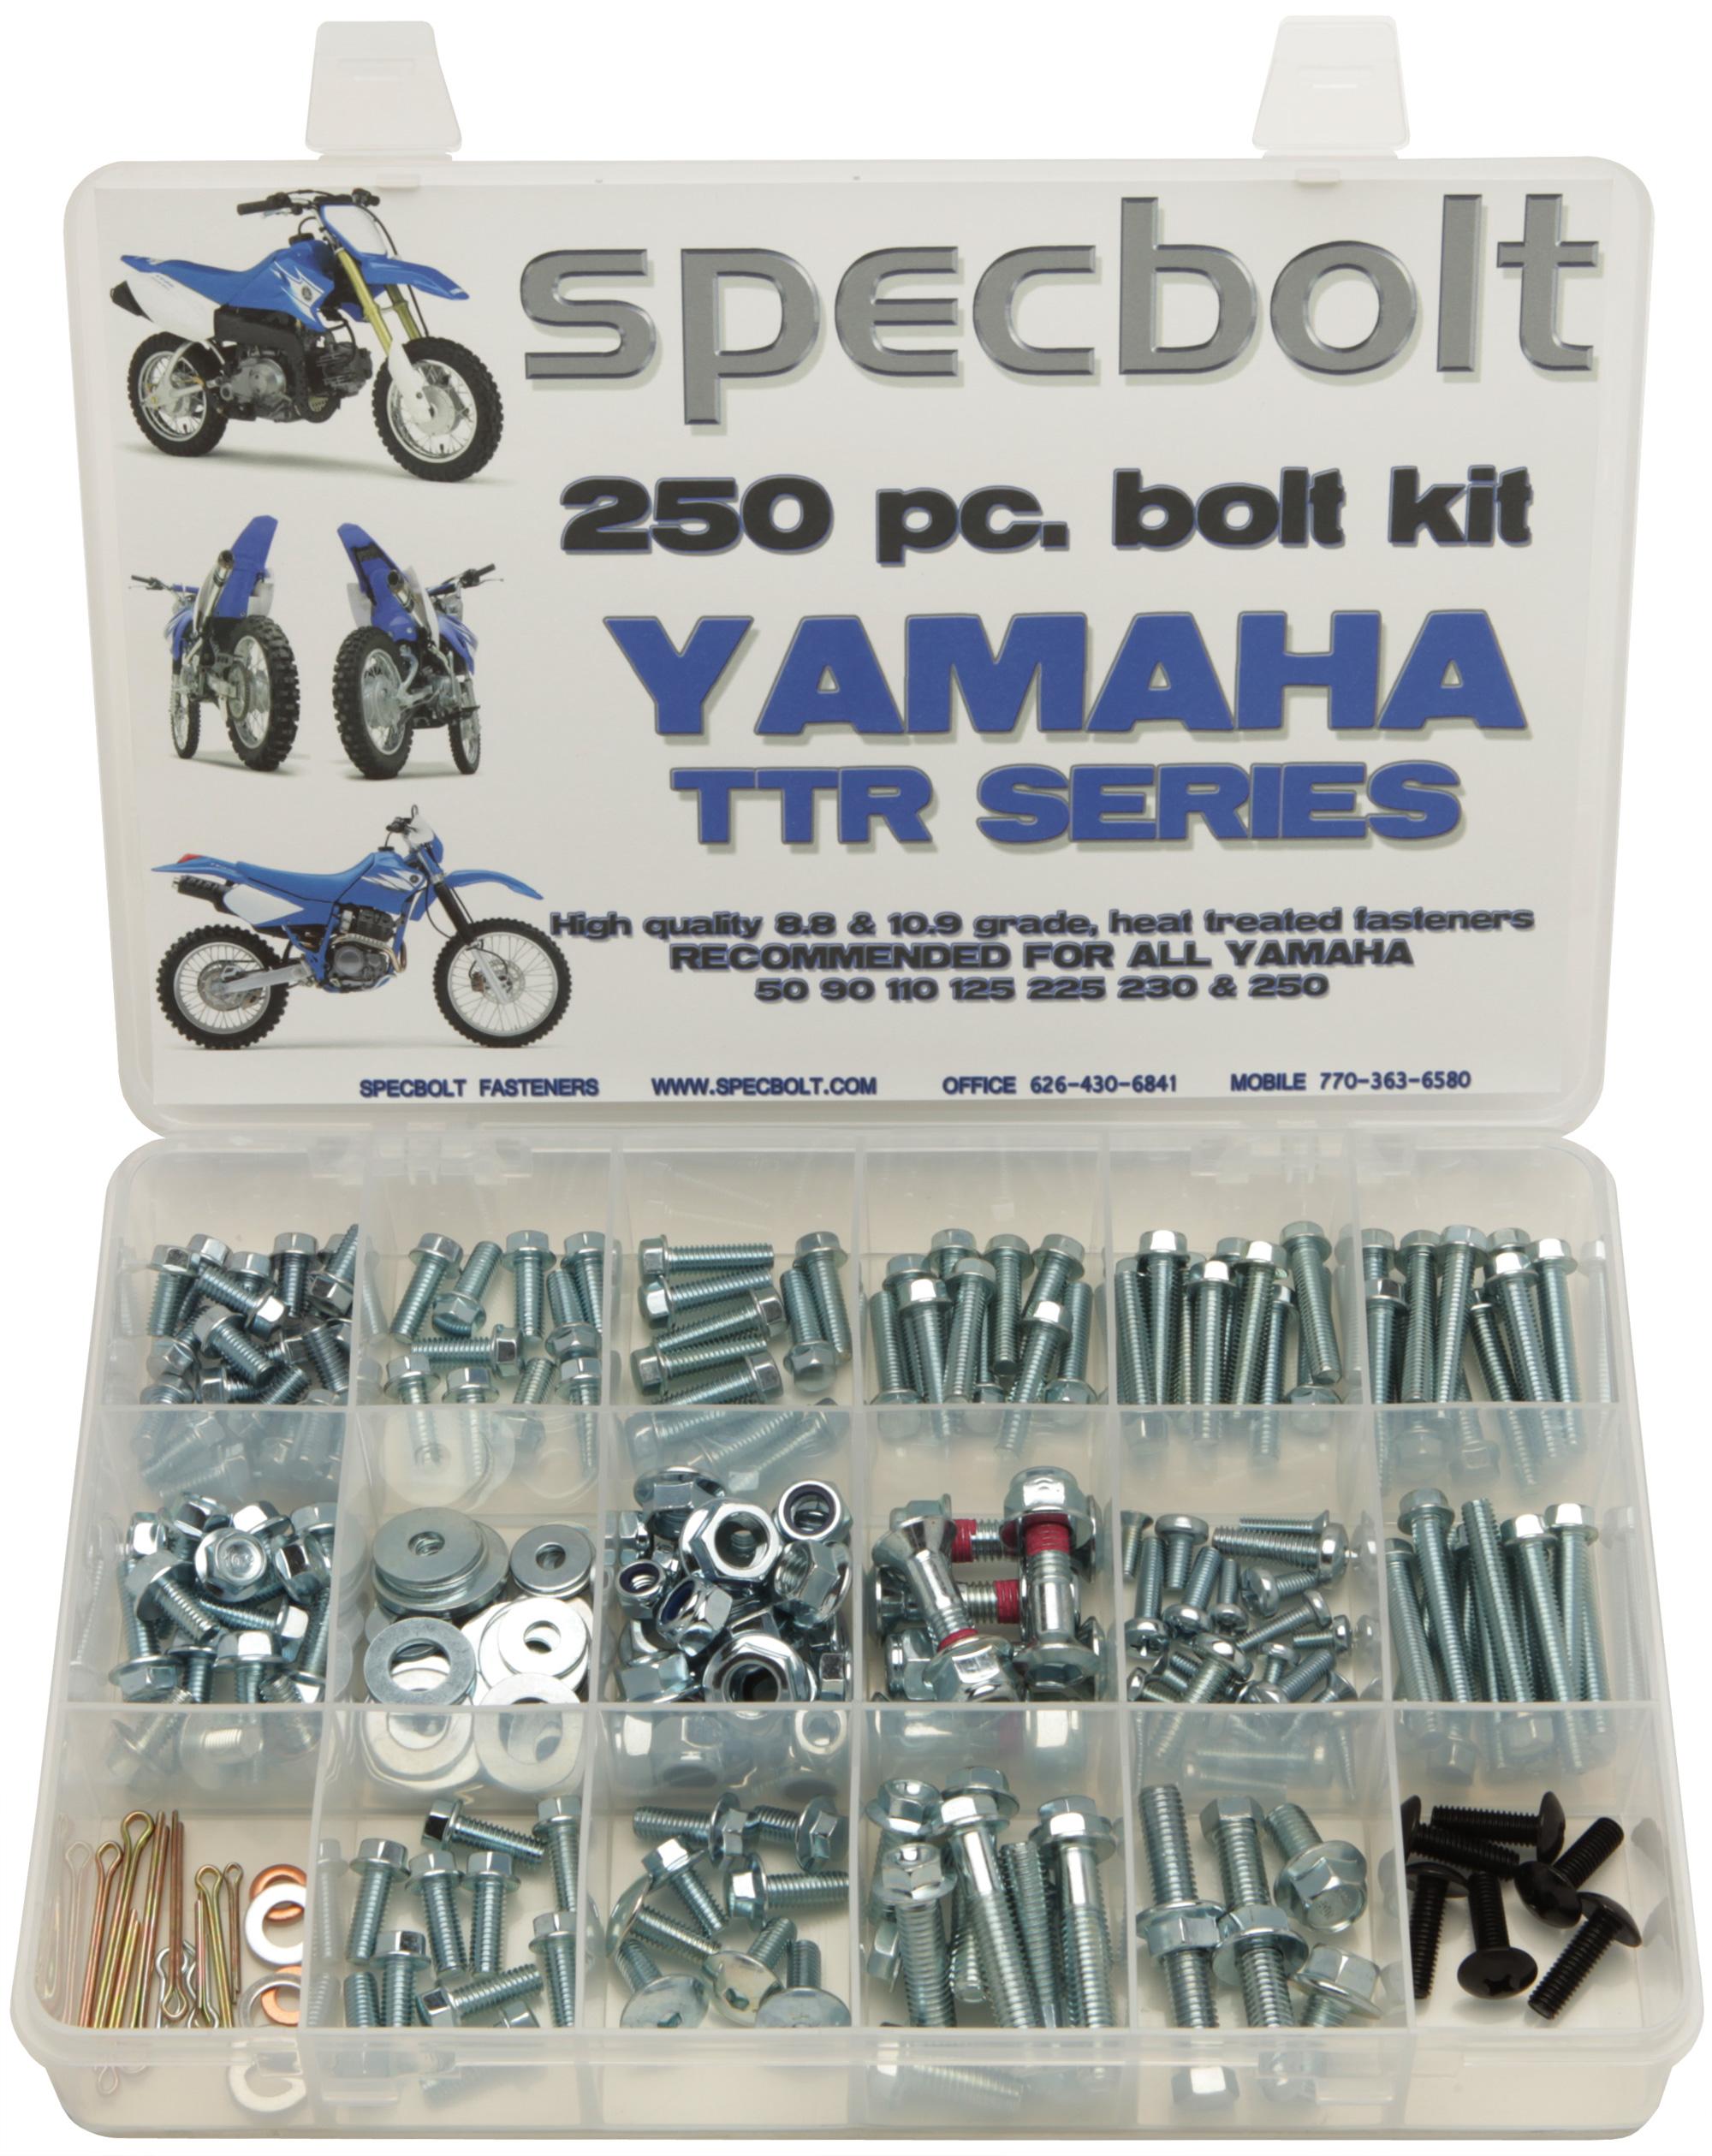 Yamaha Ttr Tt Xt Plastics And Bodywork Fastener Kit Specbolt